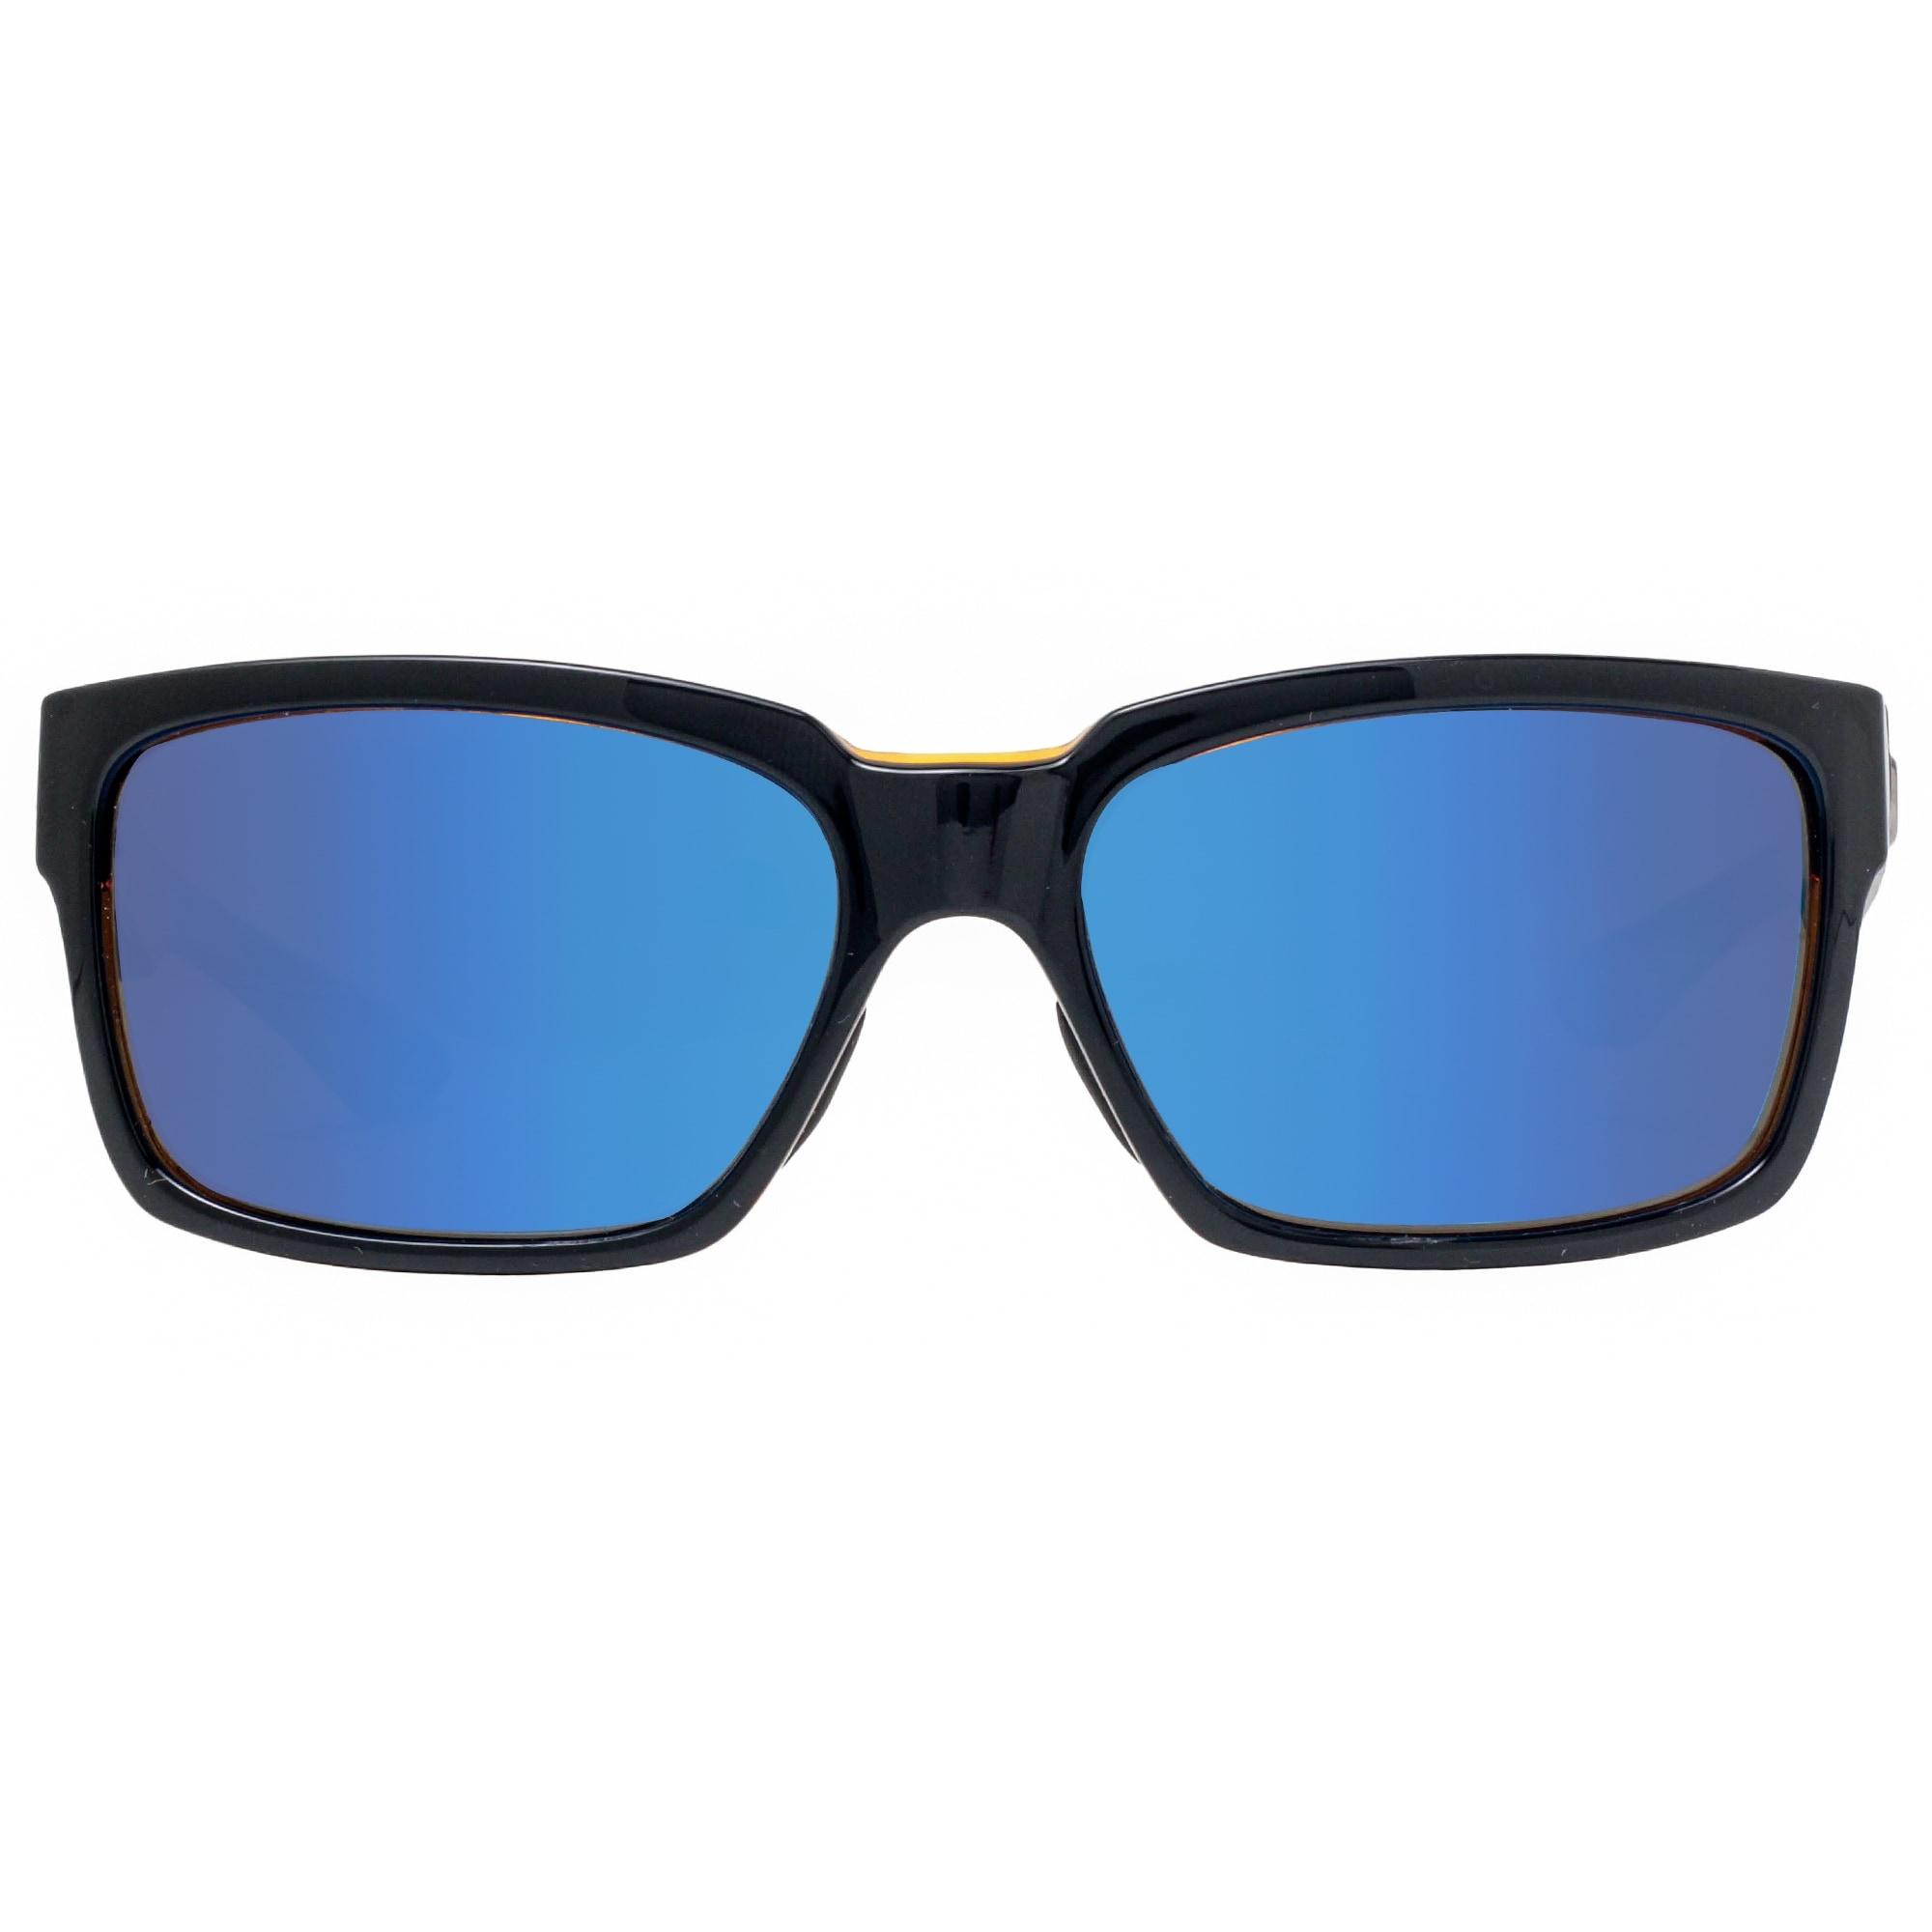 6b103d02b1 Costa Del Mar Playa PY80OBMGLP Black Amber Blue Mirror 580G Polarized  Sunglasses - black amber - 56mm-16mm-129mm